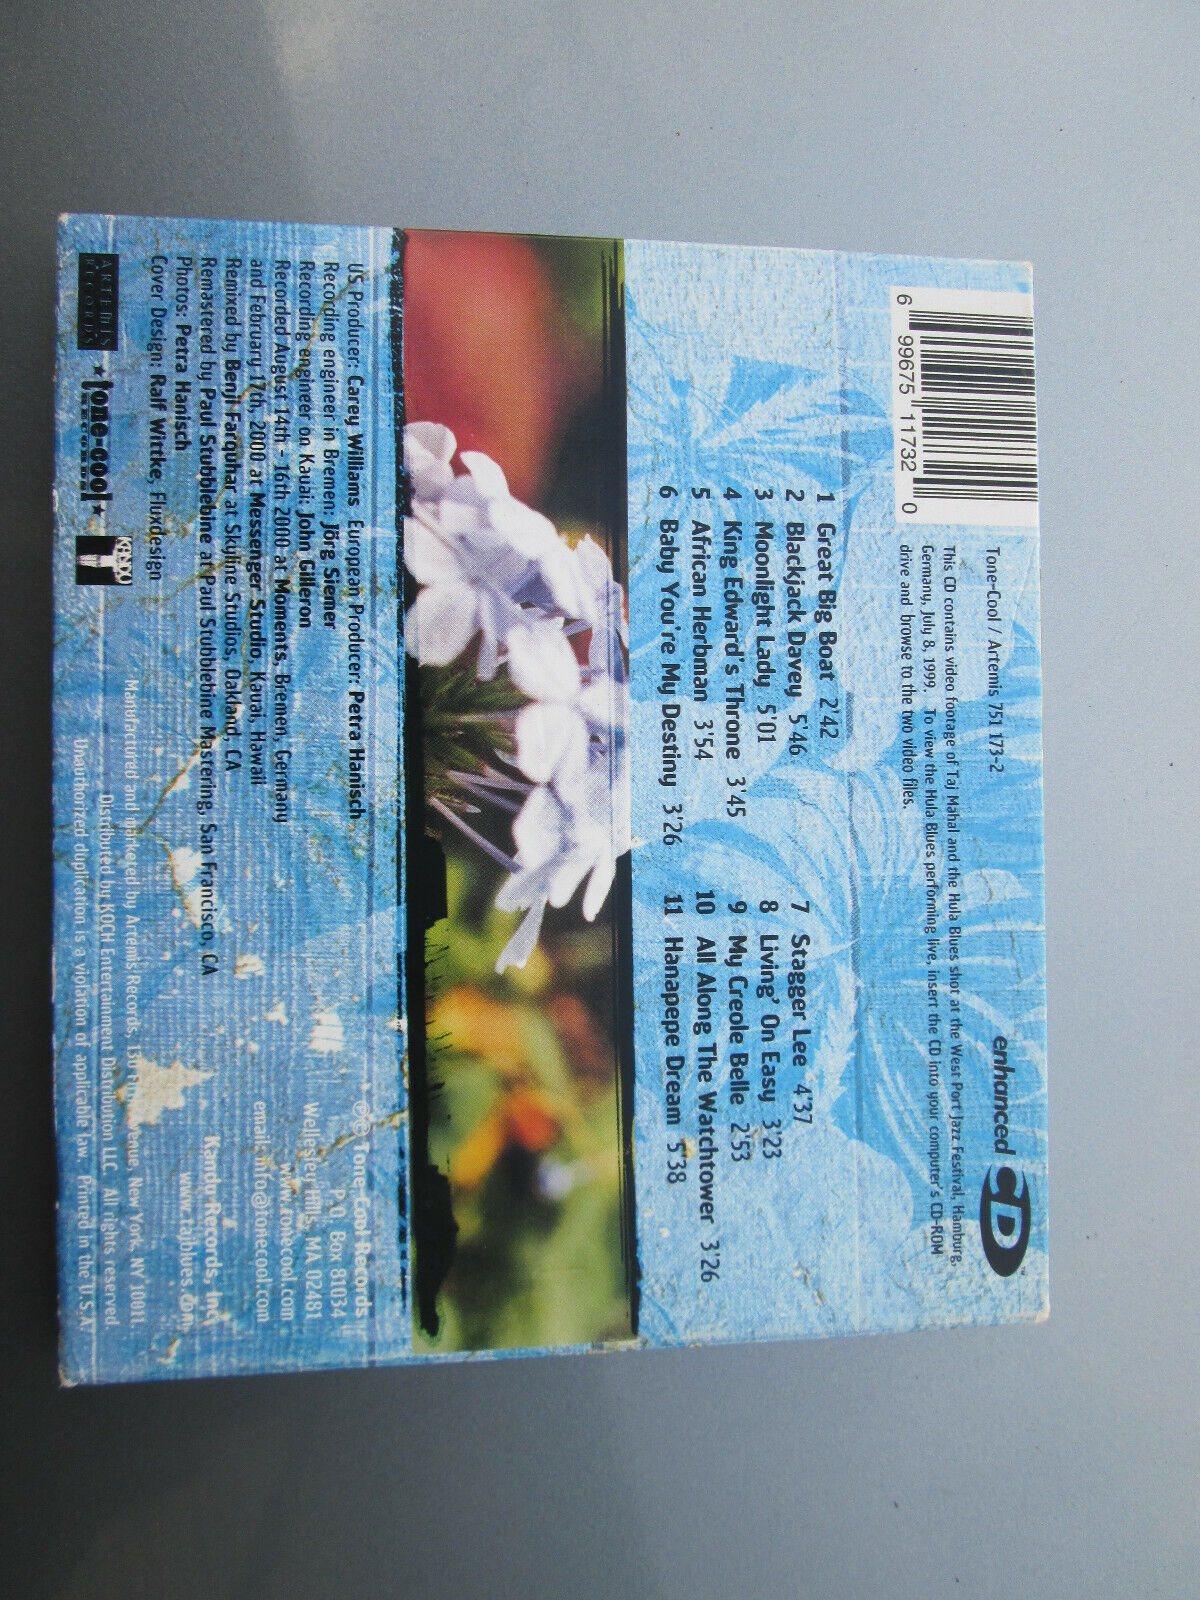 TAJ MAHAL THE HULA BLUES BAND - HANAPEPE DREAM CD W/ 2 Video Tracks  - $14.99